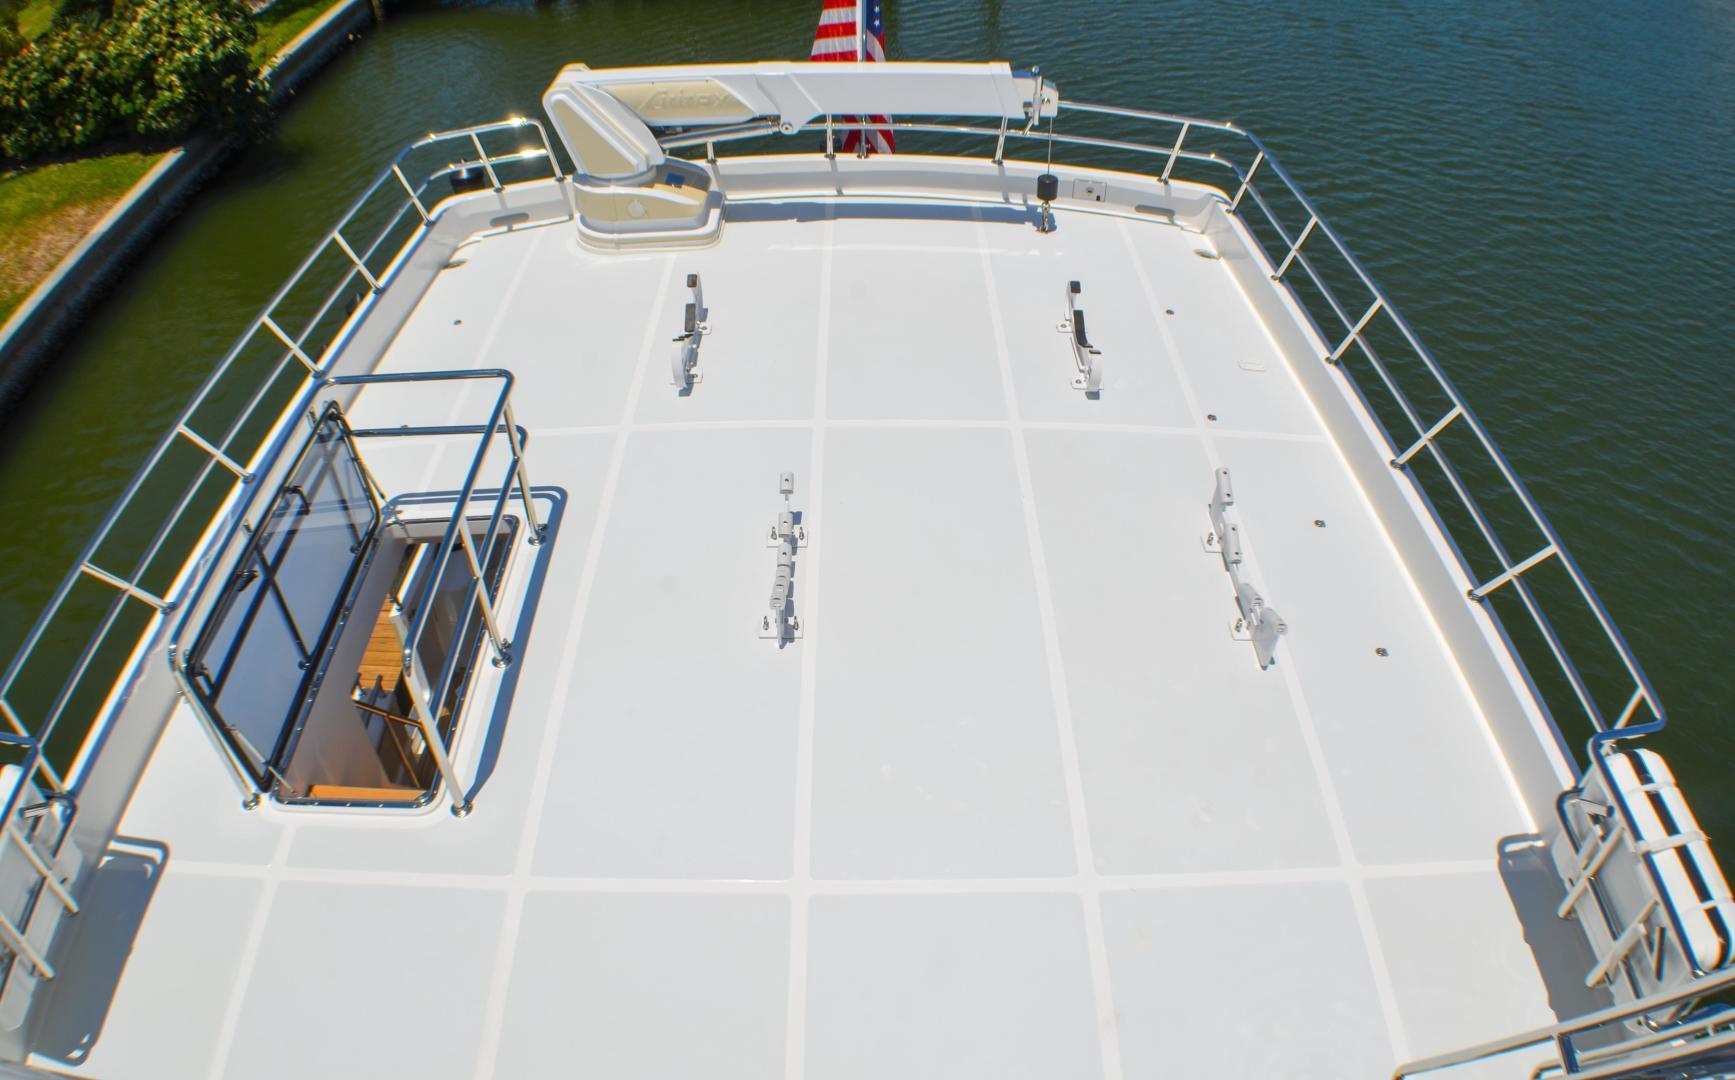 Outer Reef Yachts-860 DBMY 2017-Simon Says Vero Beach-Florida-United States-1488220 | Thumbnail